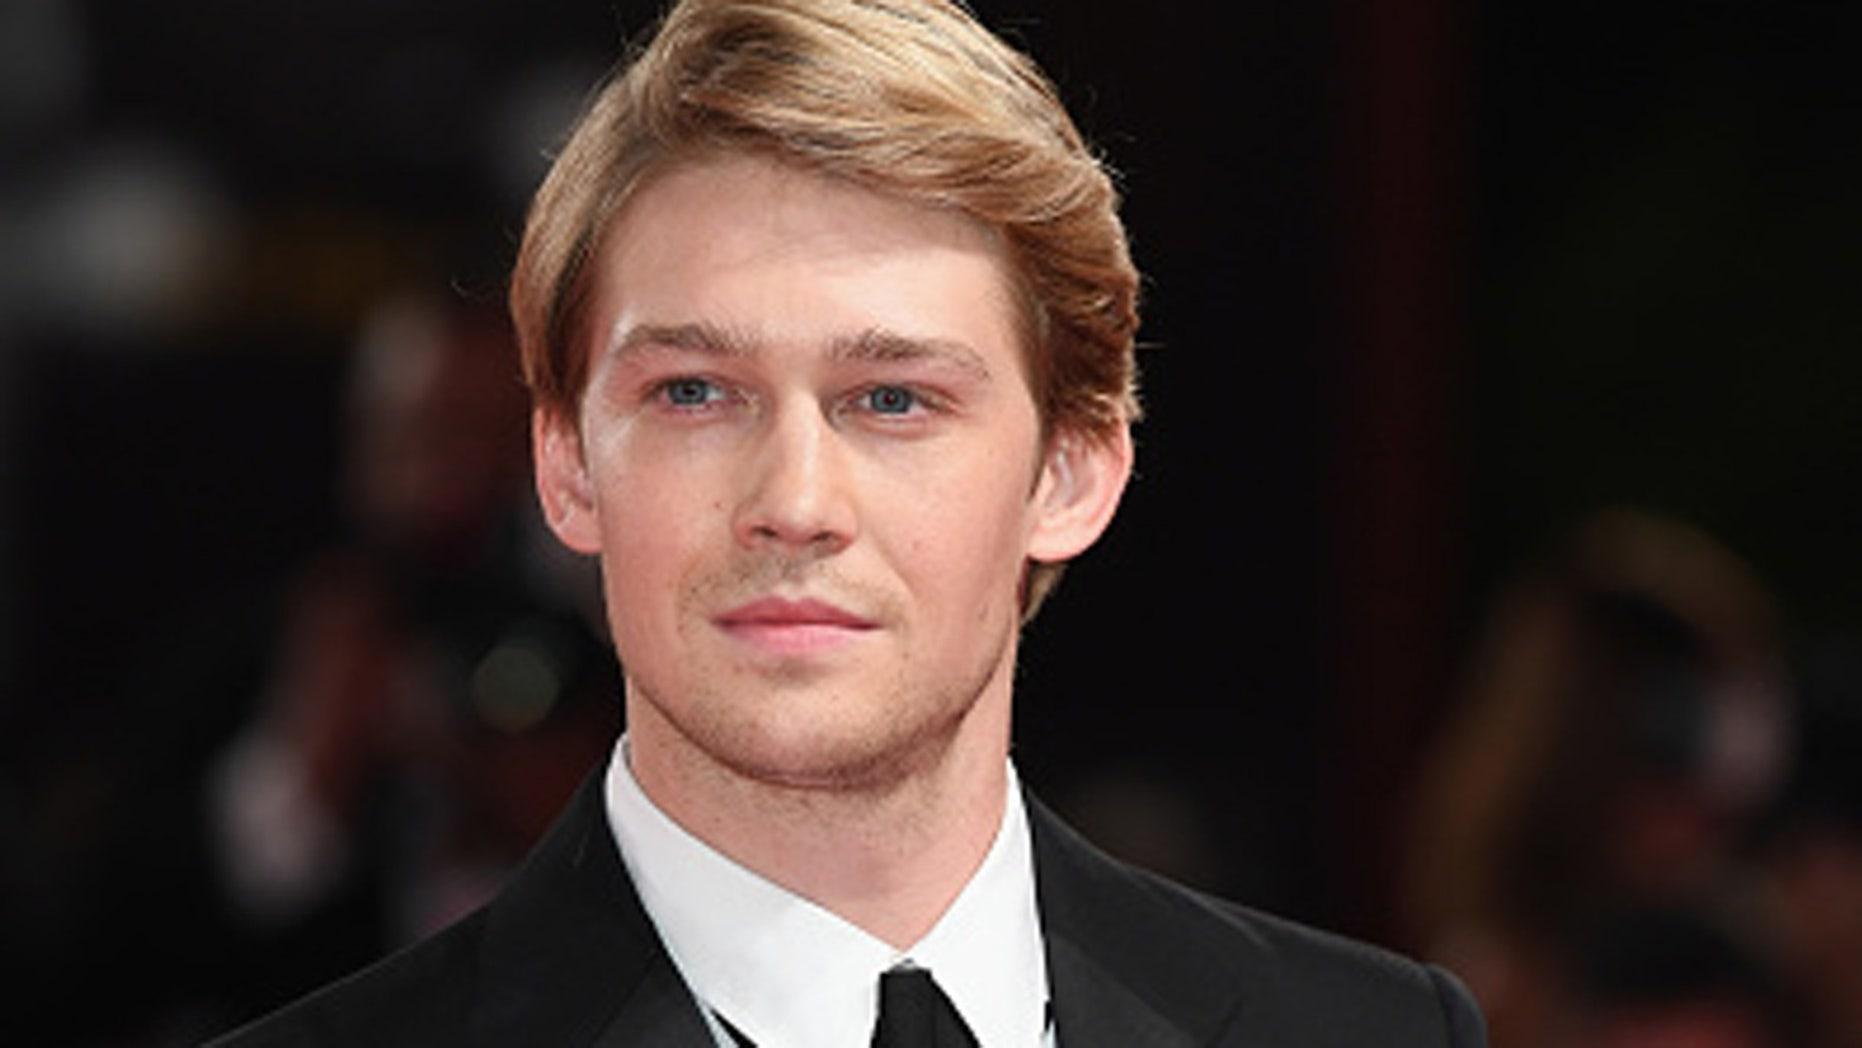 Taylor Swift's boyfriend, British actor Joe Alywn, attends Venice Film Festival with Swift's good friend Emma Stone.